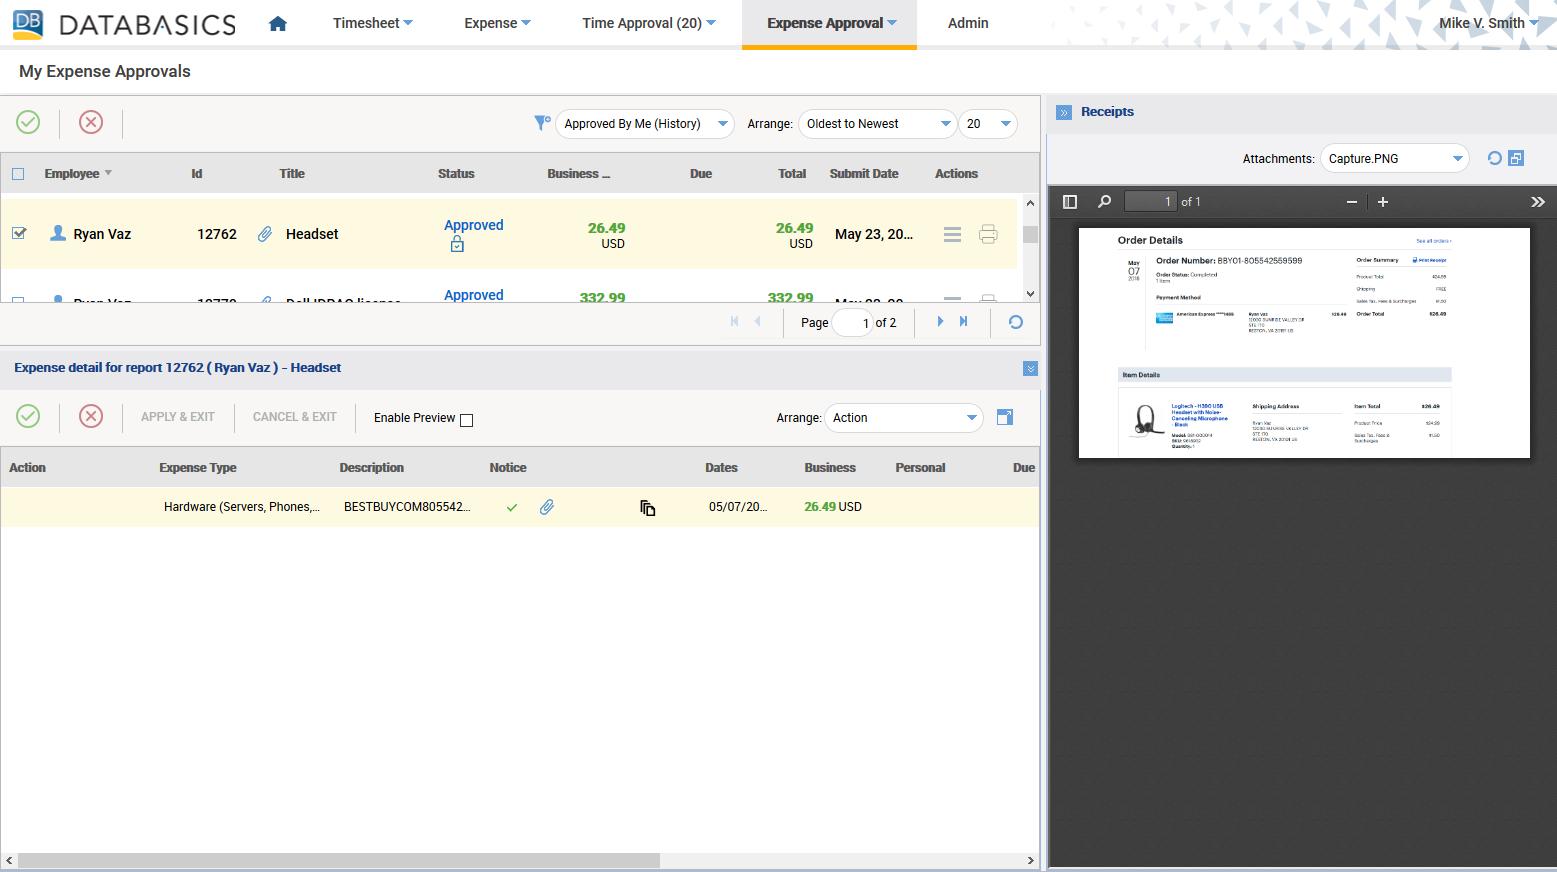 DATABASICS Expense Demo - DATABASICS Expense — Desktop Expense Approval